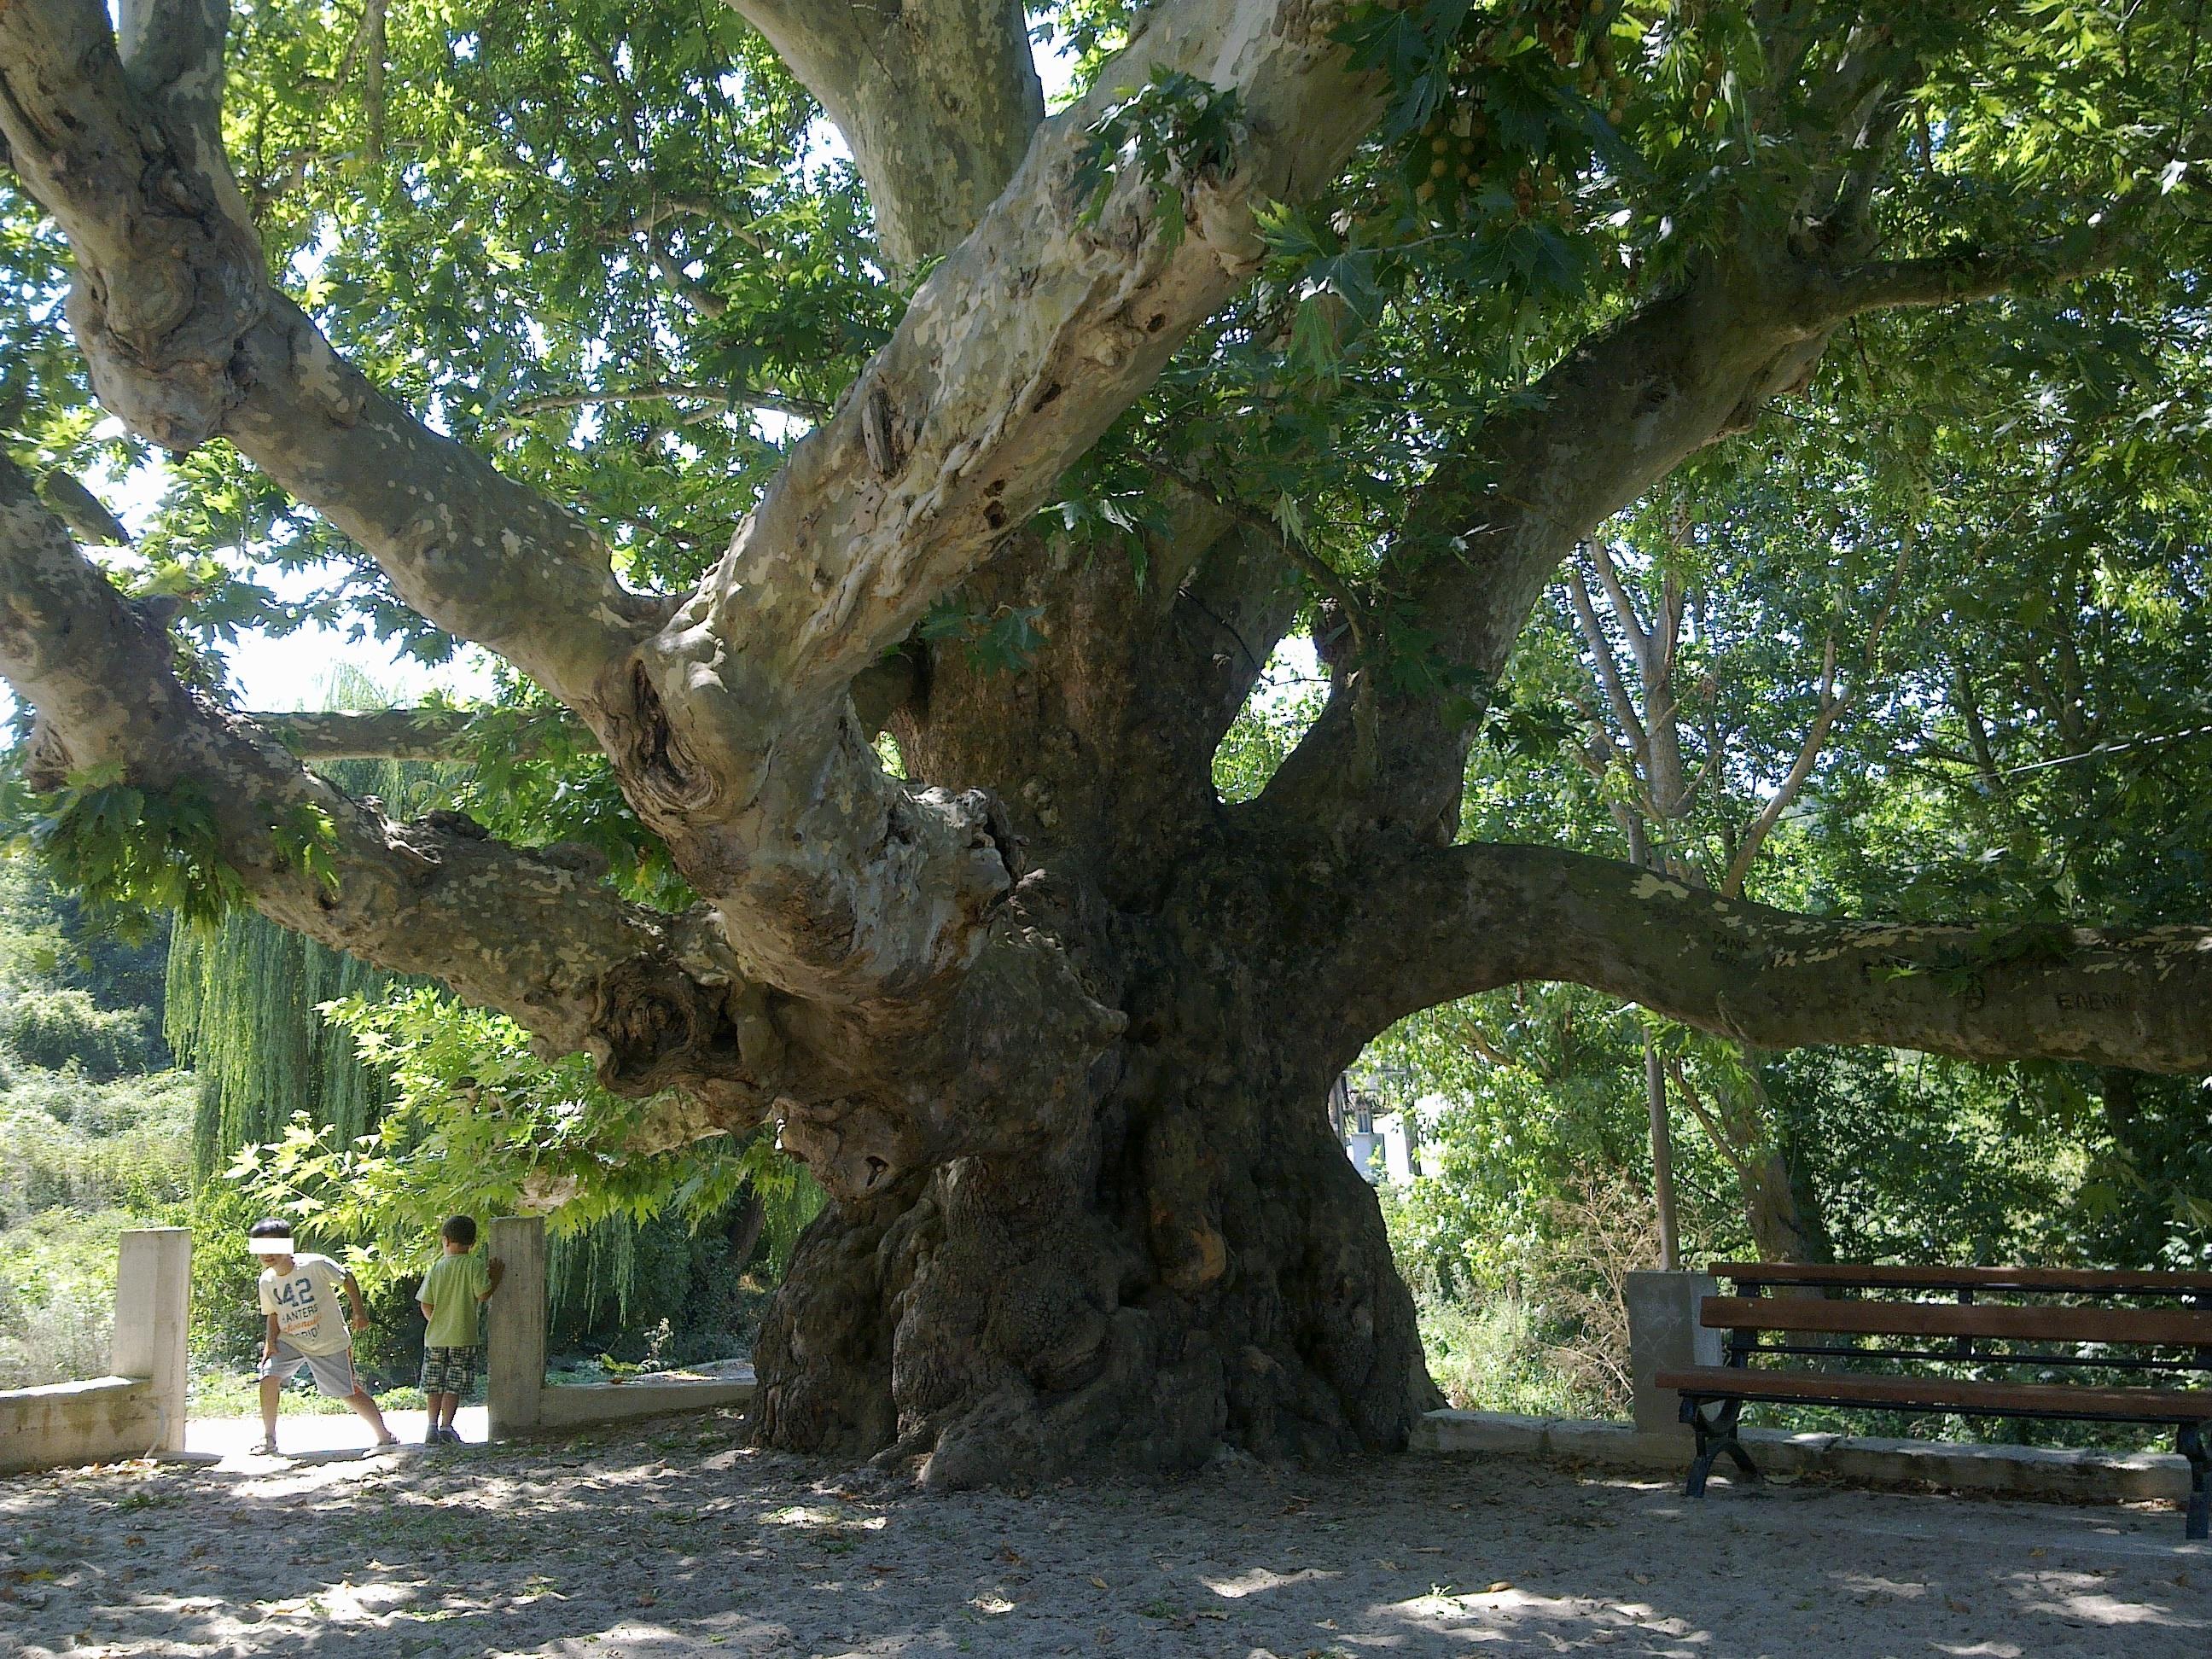 Under the Plane Tree